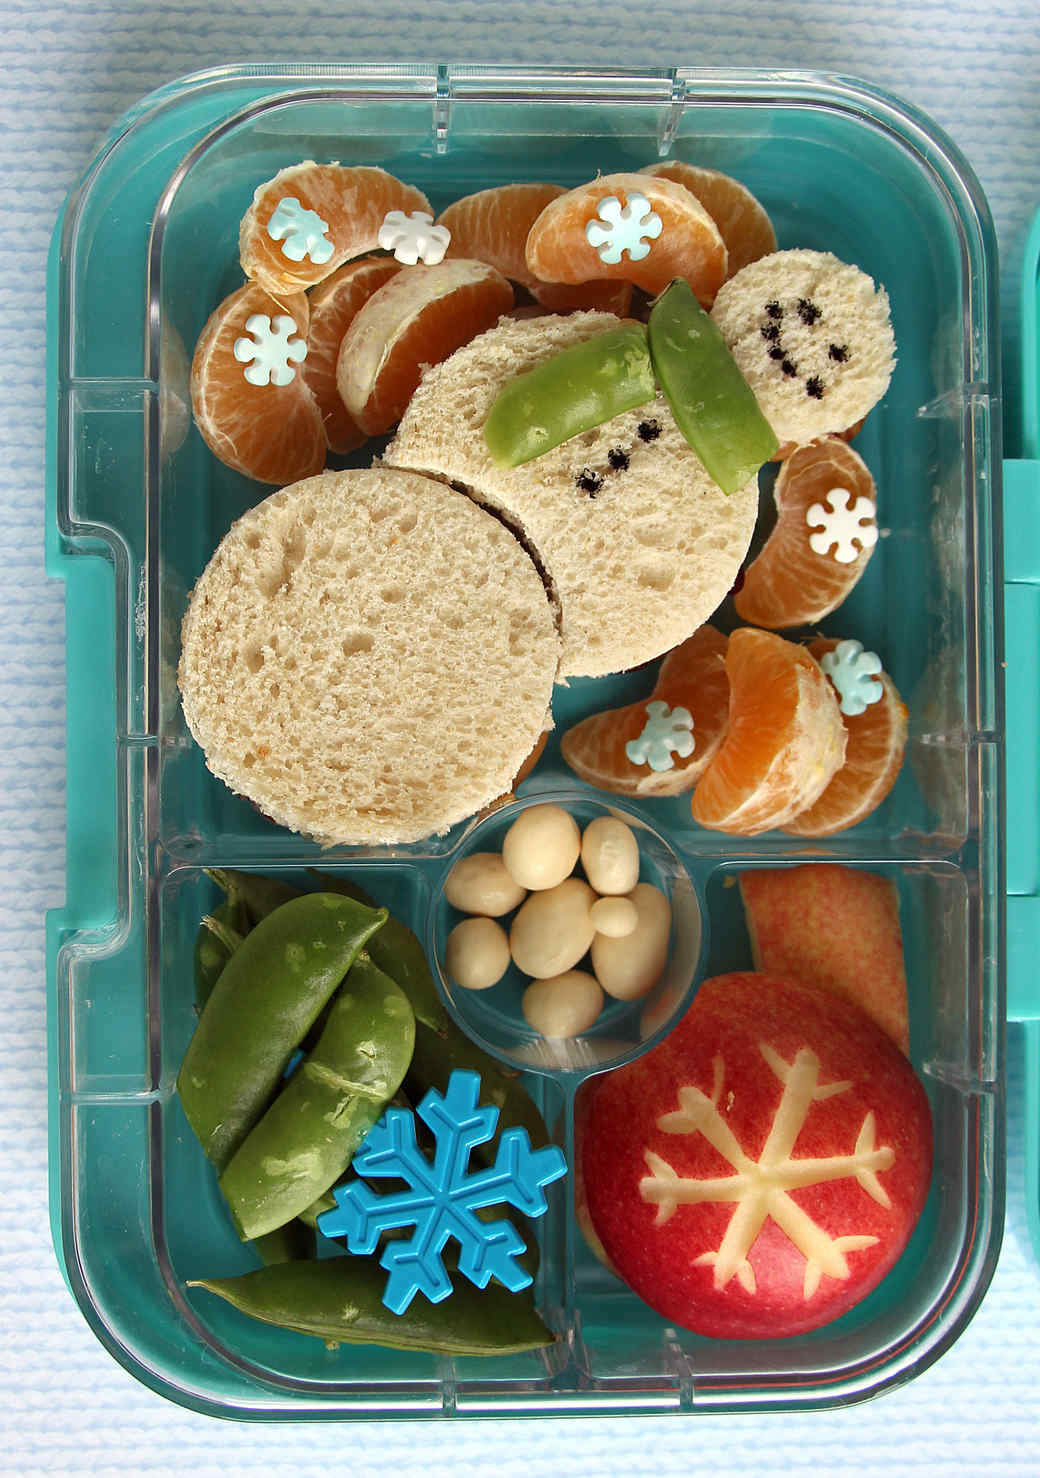 snowman-bento-box.jpg (skyword:357486)